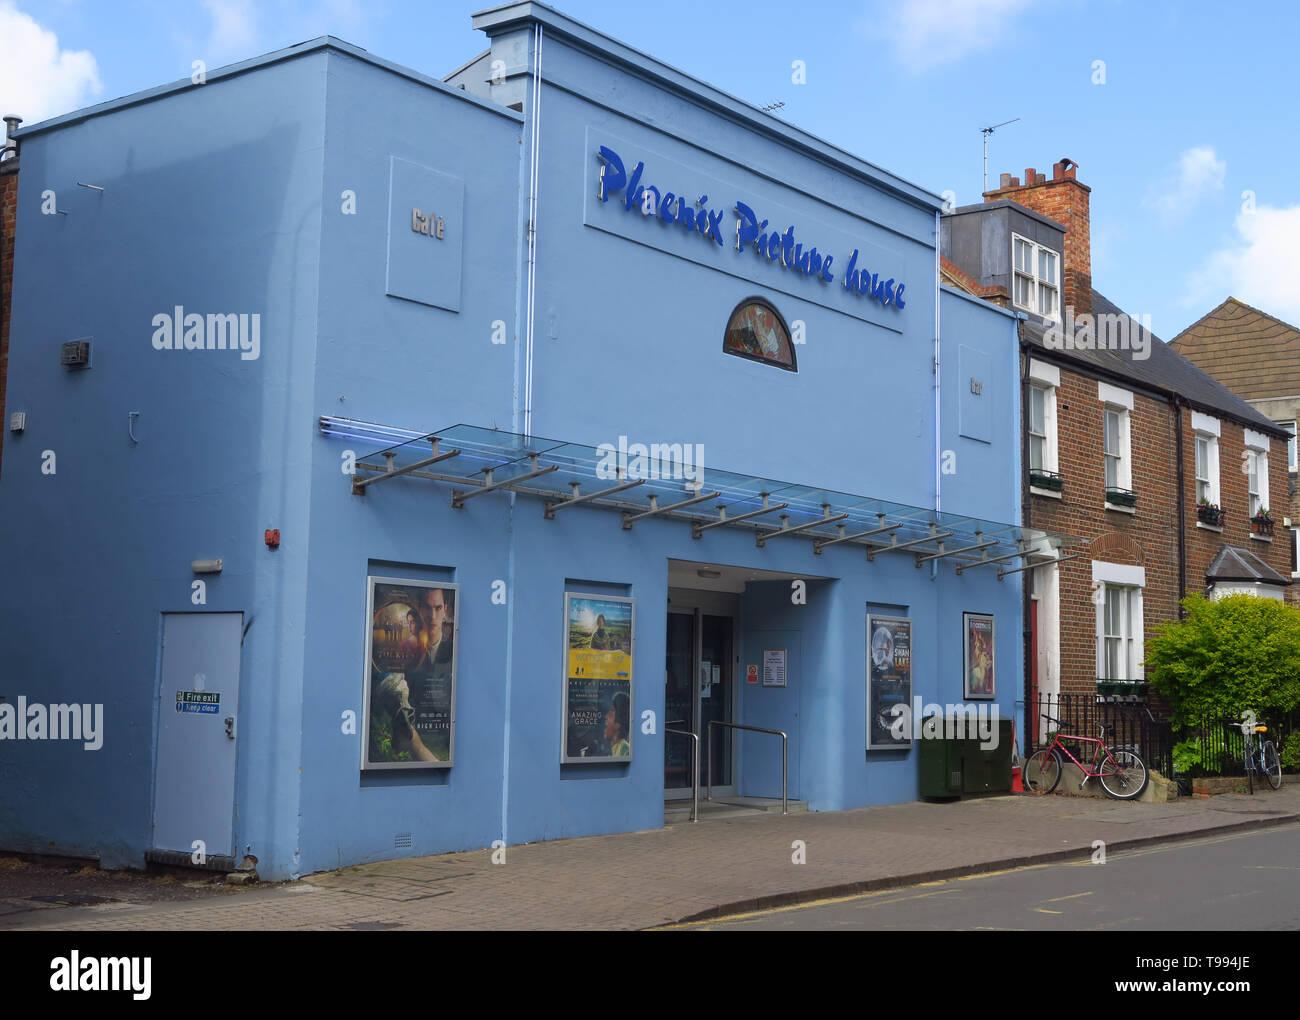 Phoenix Picture House, Walton Street, Jericho, Oxford Stock Photo